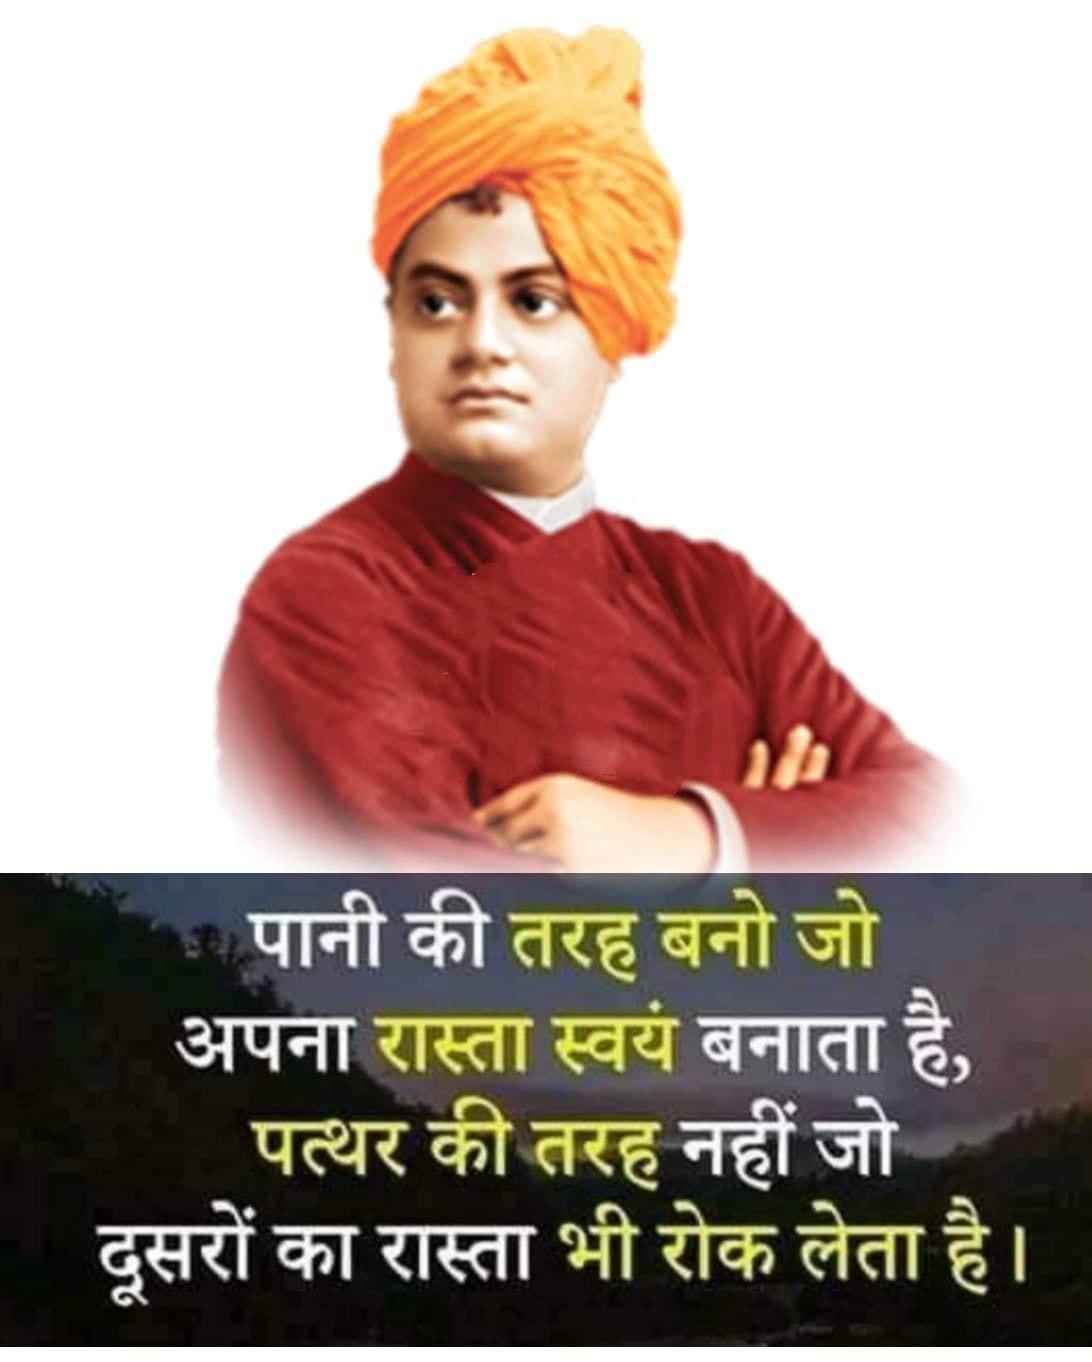 swami vivekananda kadvi sacchi baatein for youth